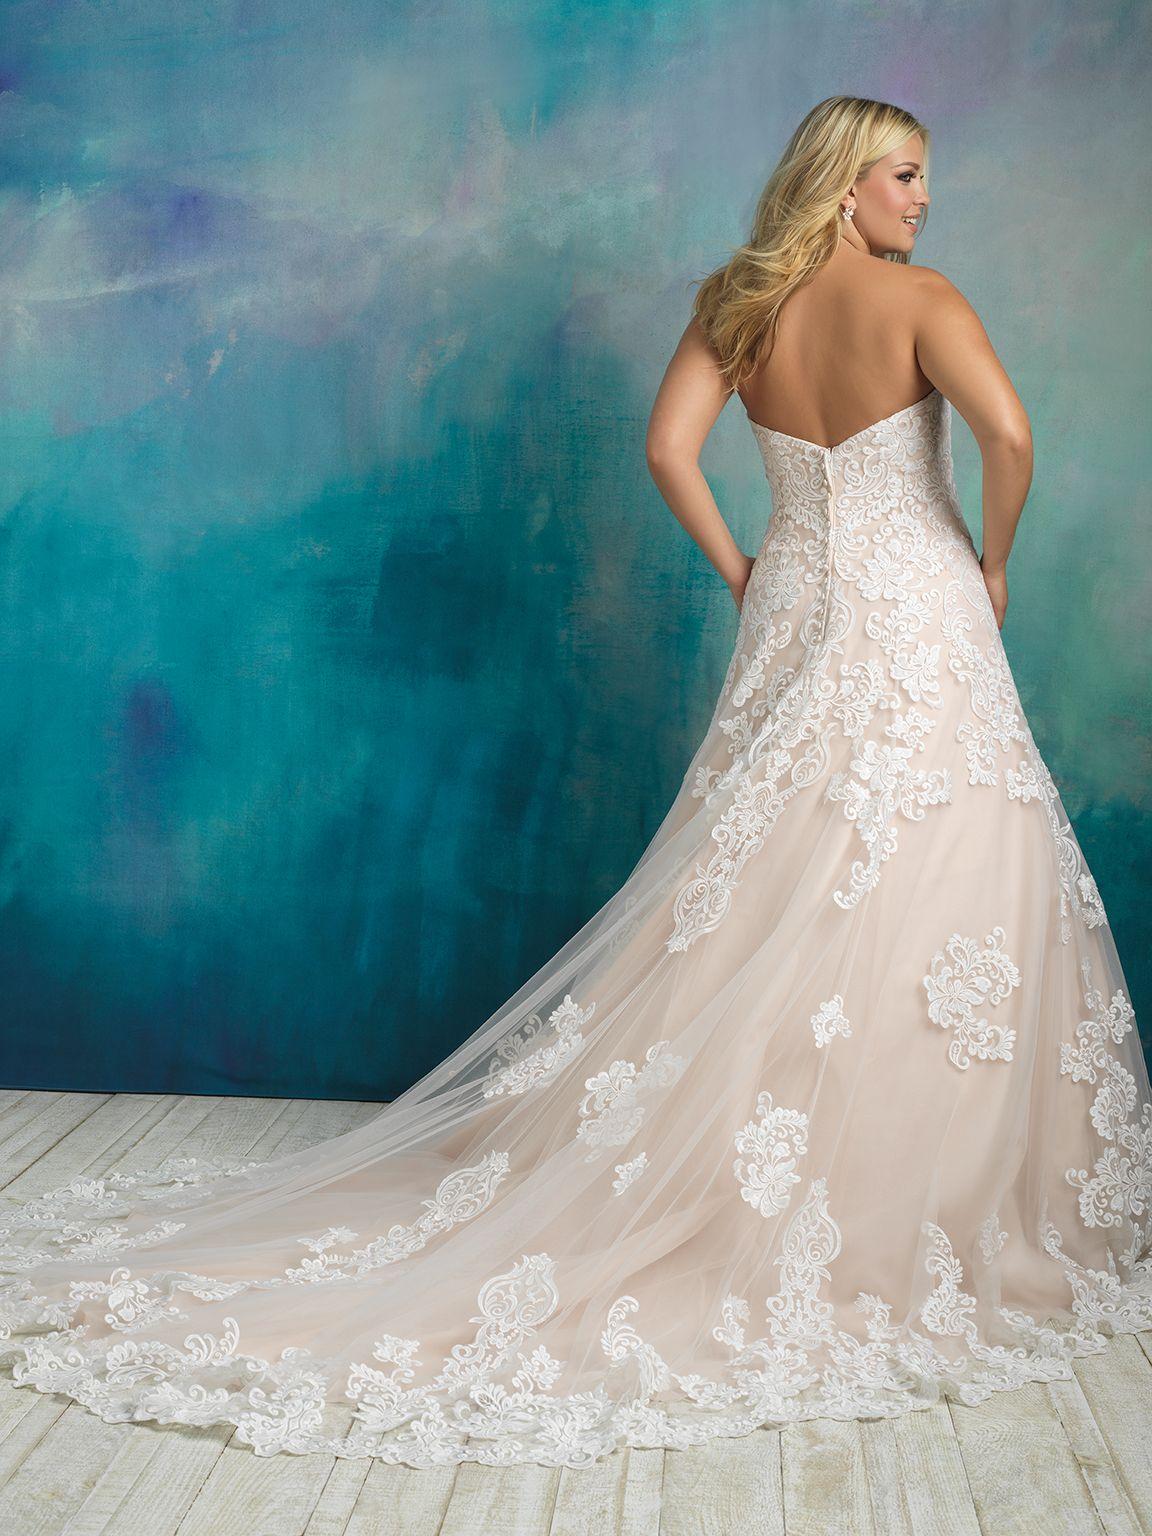 Allure bridal Style: W413   Taylor/Wedding Things   Pinterest